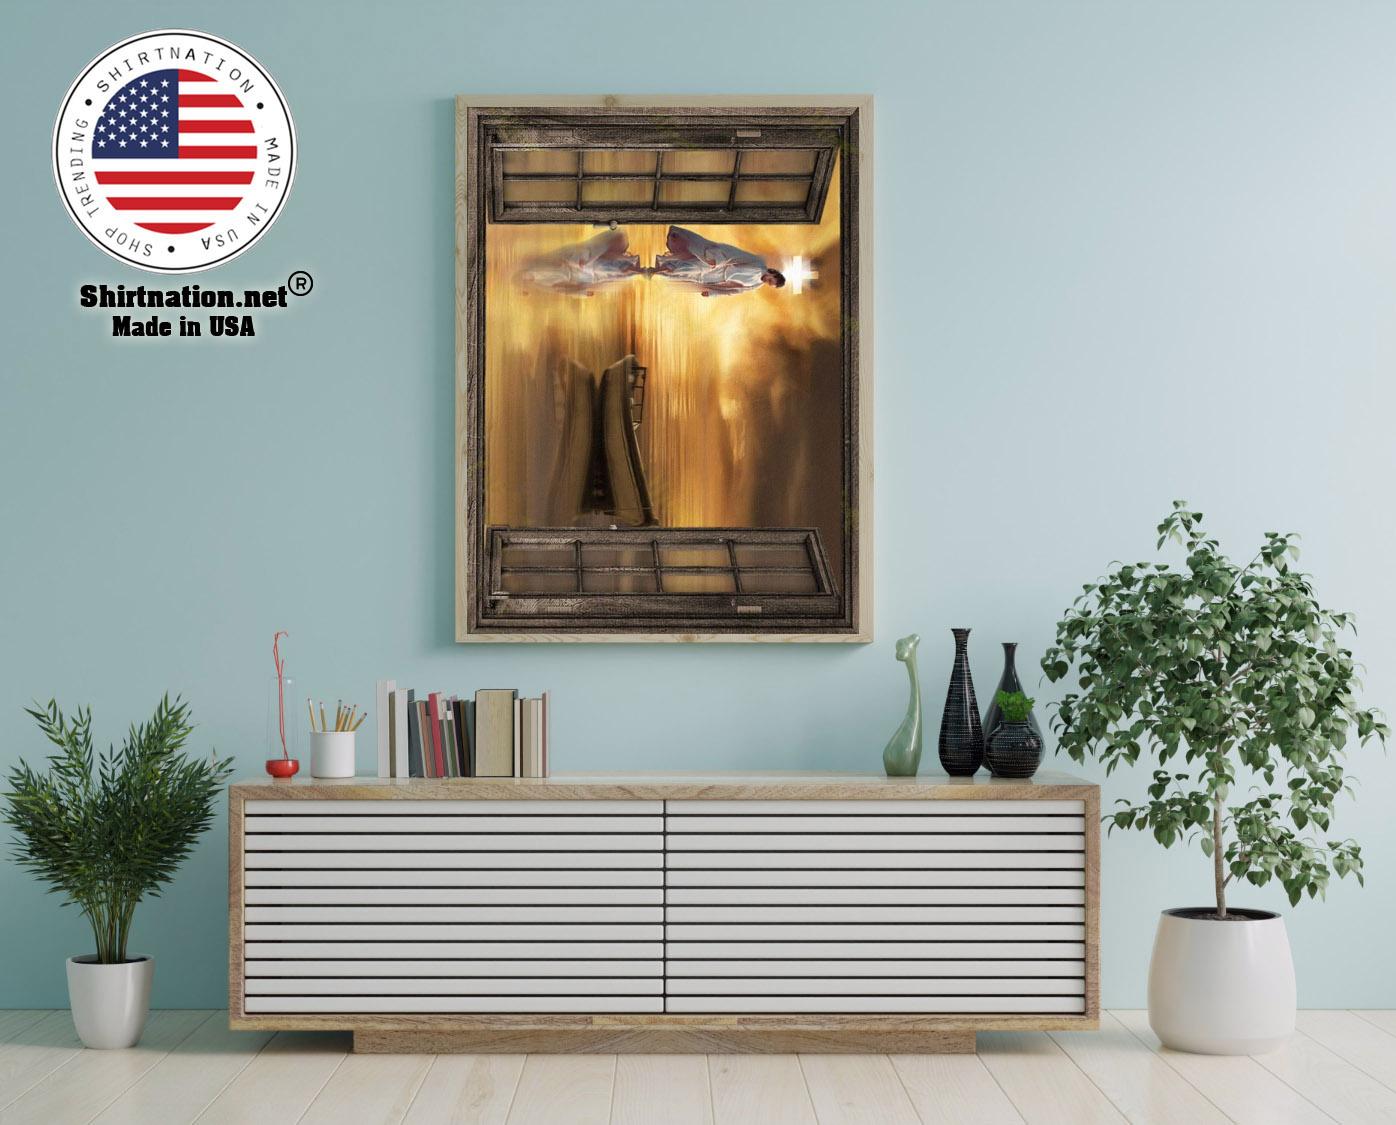 Jesus through the window poster 12